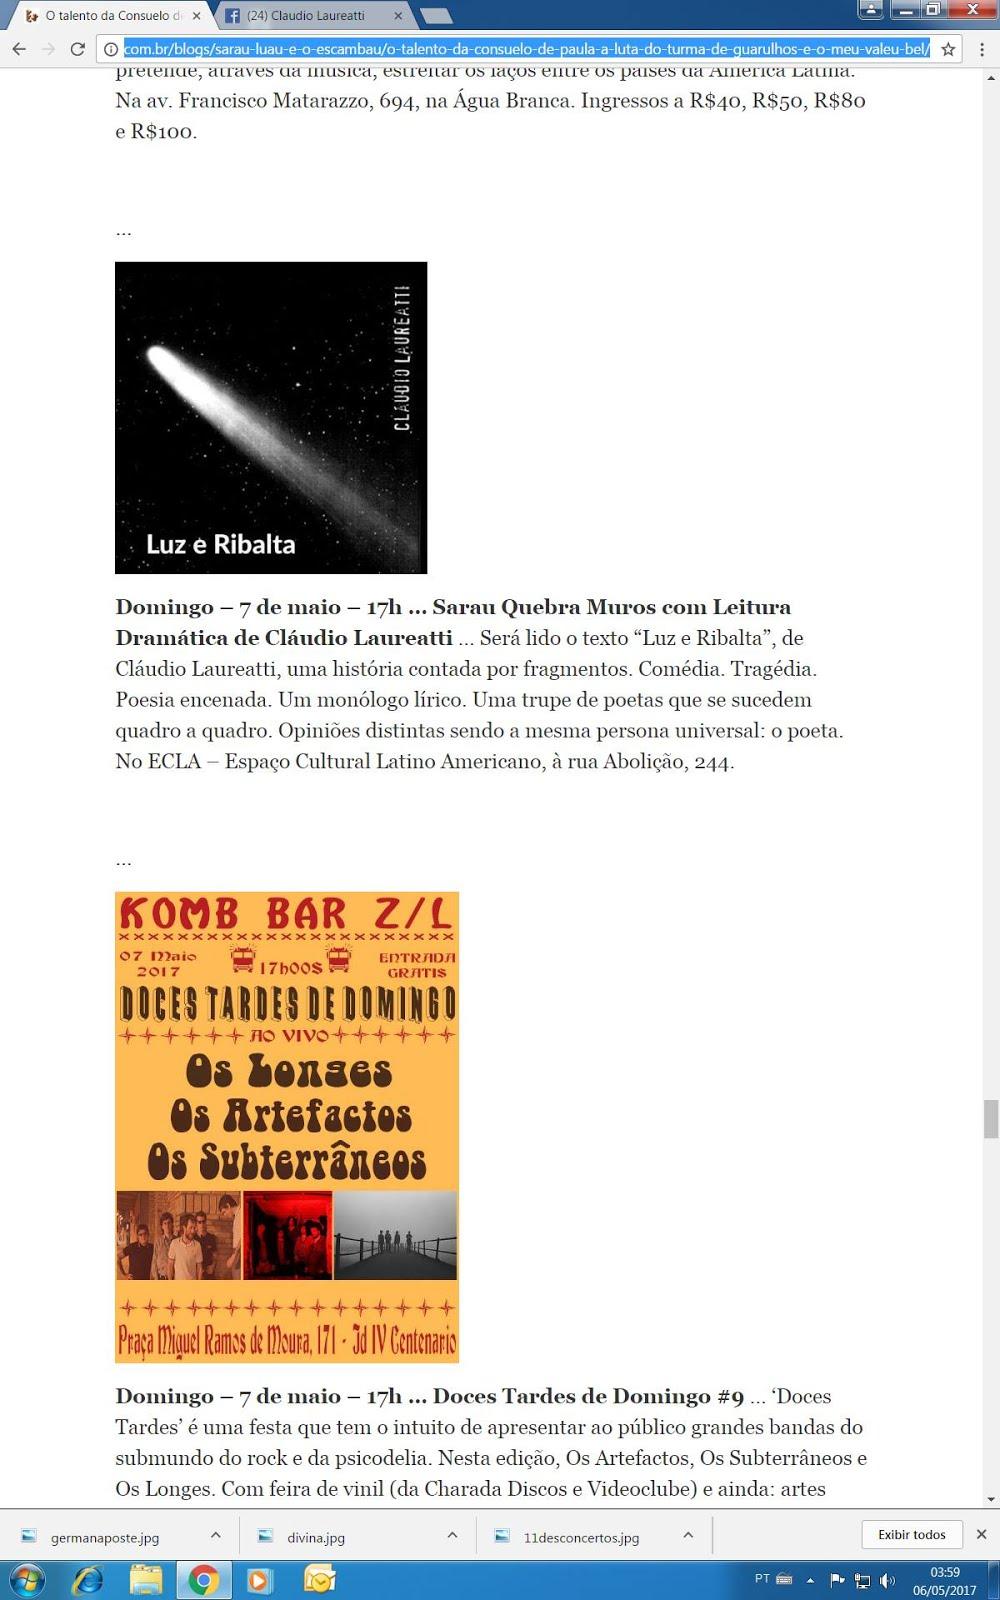 Luz e Ribalta no ECLA (Espaço Cultural Latino-Americano)